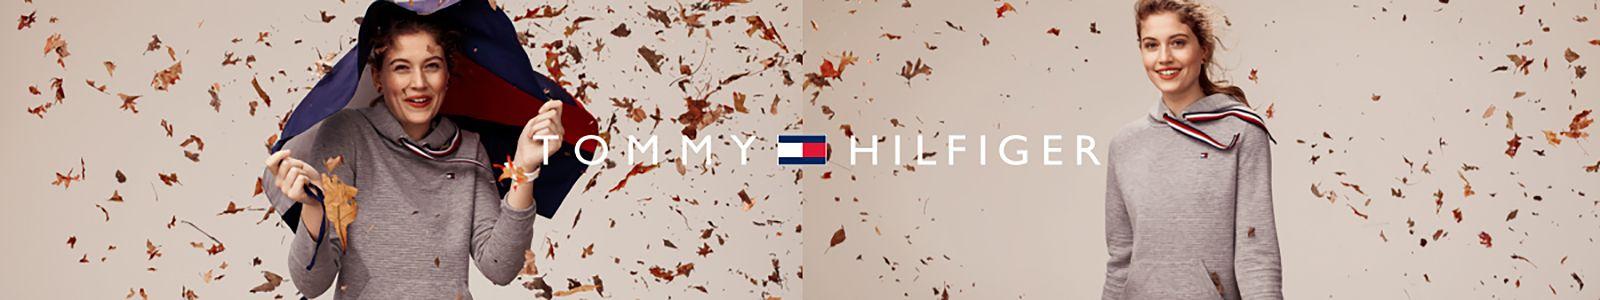 Tommy Hilfigure